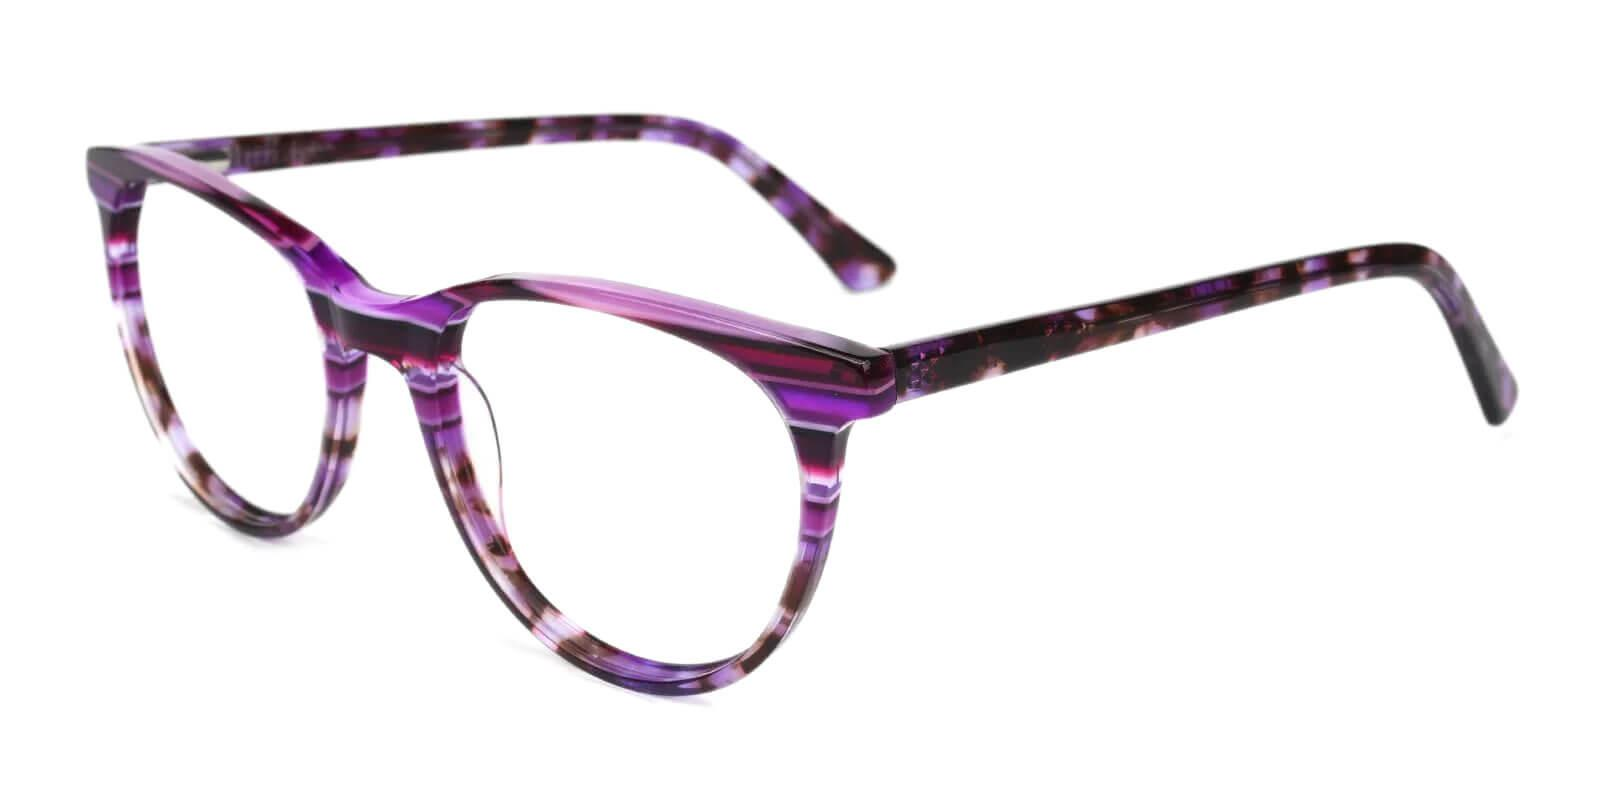 Perceive Purple Acetate Eyeglasses , SpringHinges , UniversalBridgeFit Frames from ABBE Glasses